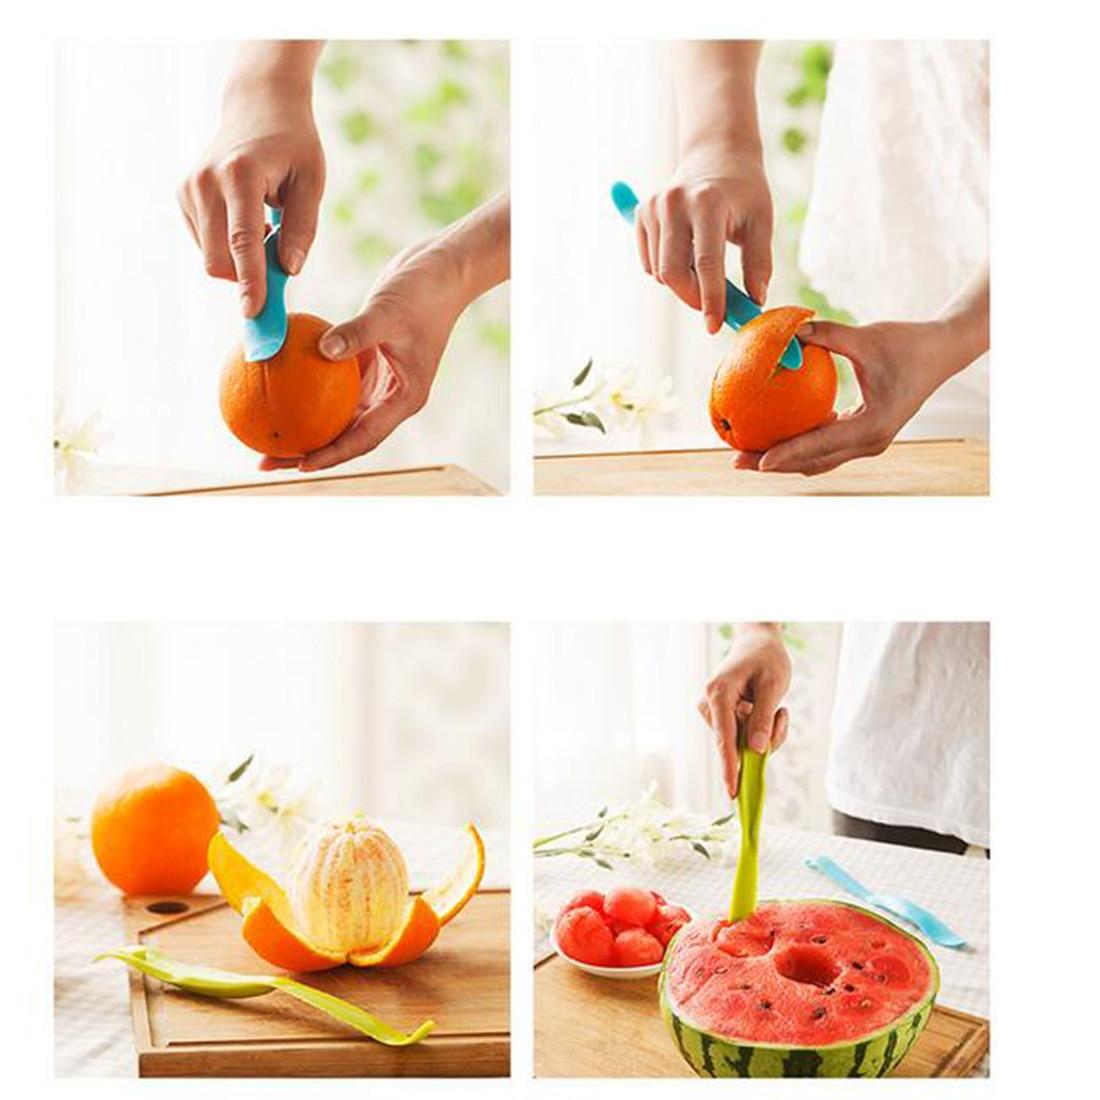 Uncategorized Universal Kitchen Appliances knife kitchen appliances promotion shop for promotional useful home hutch appliance cute universal fruit gadgets peeler barker